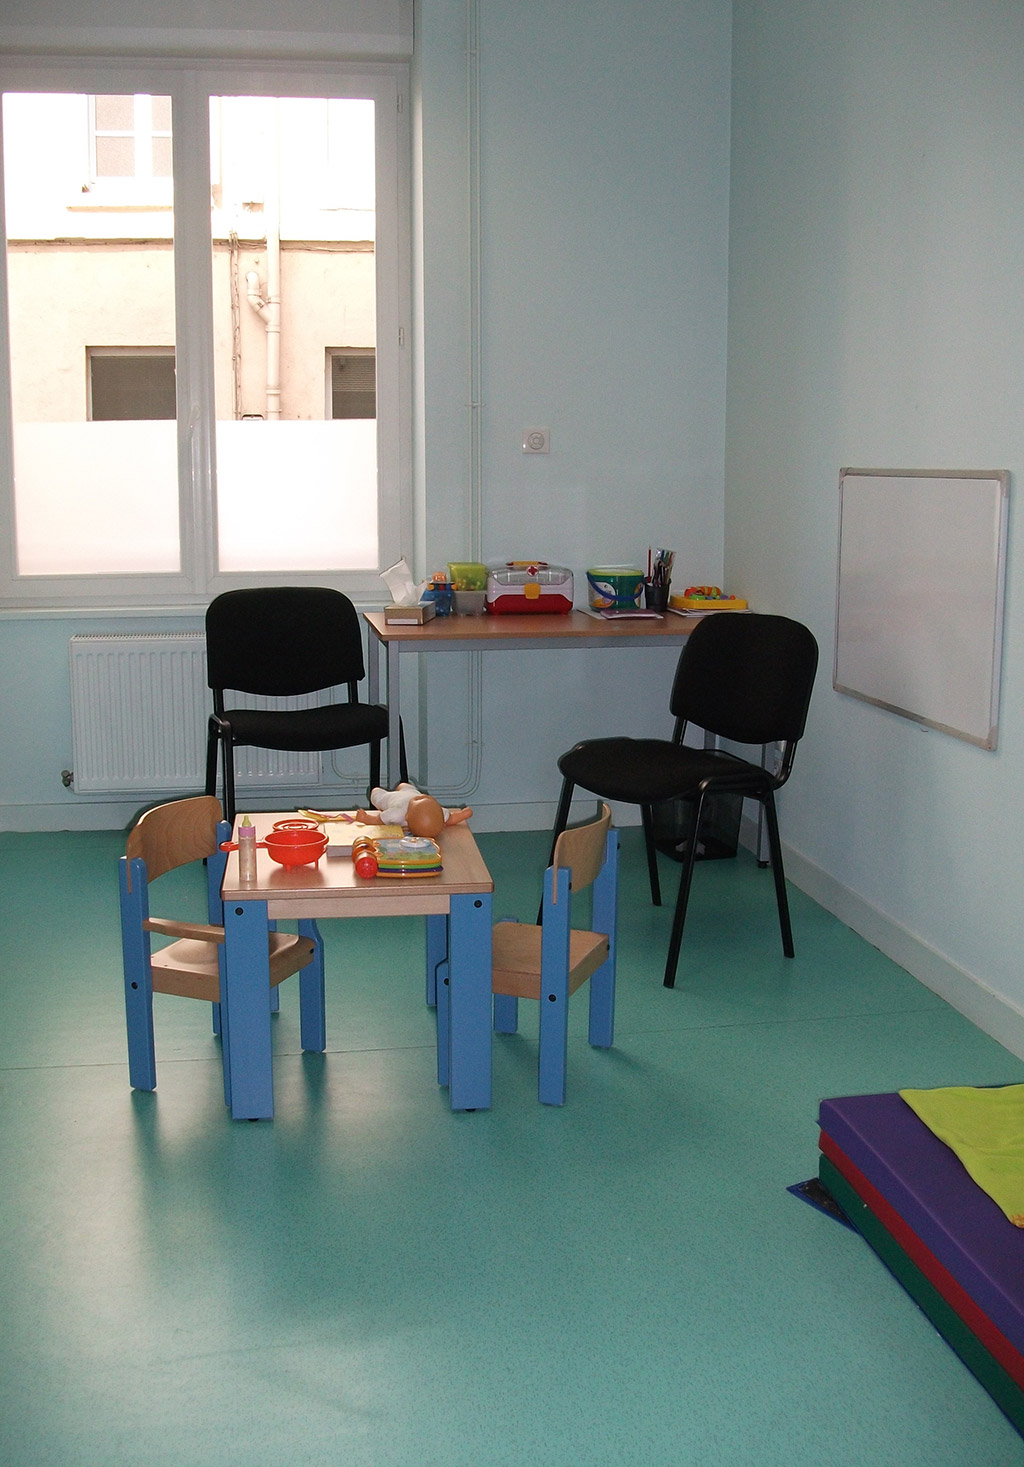 Tarare-salle-pedopsychiatre-et-psychologue